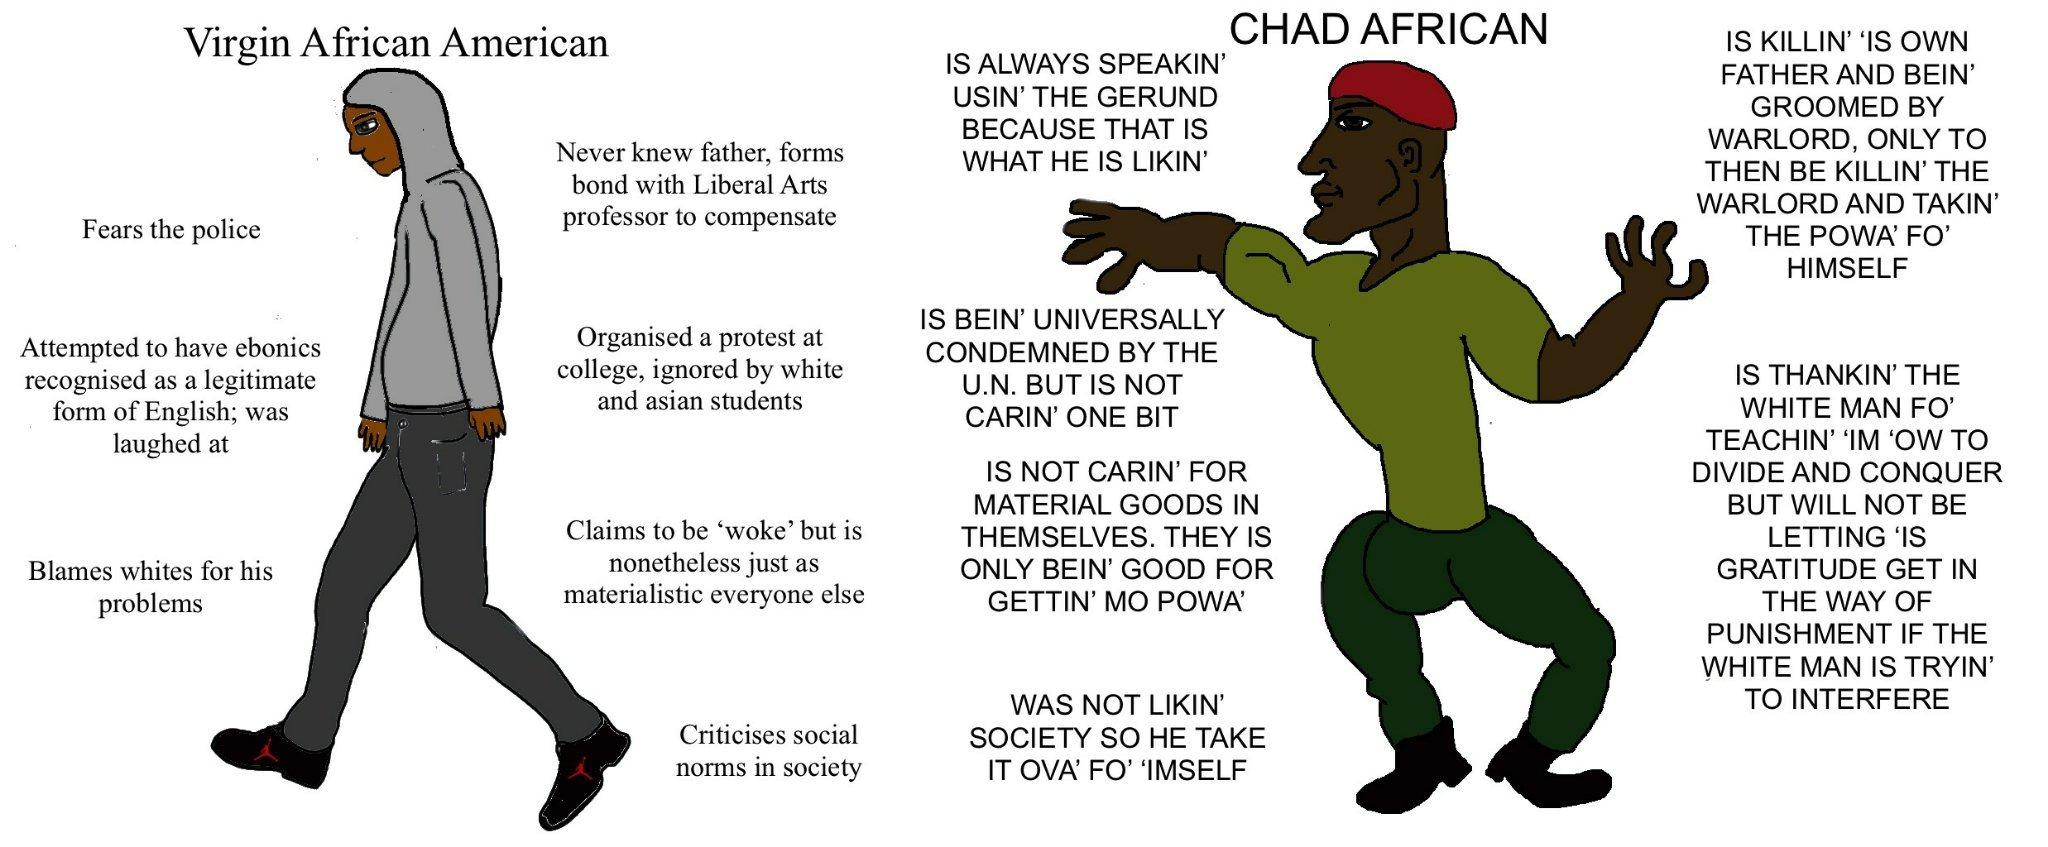 Classic Virgin vs Chad - Meme by Campus147 :) Memedroid